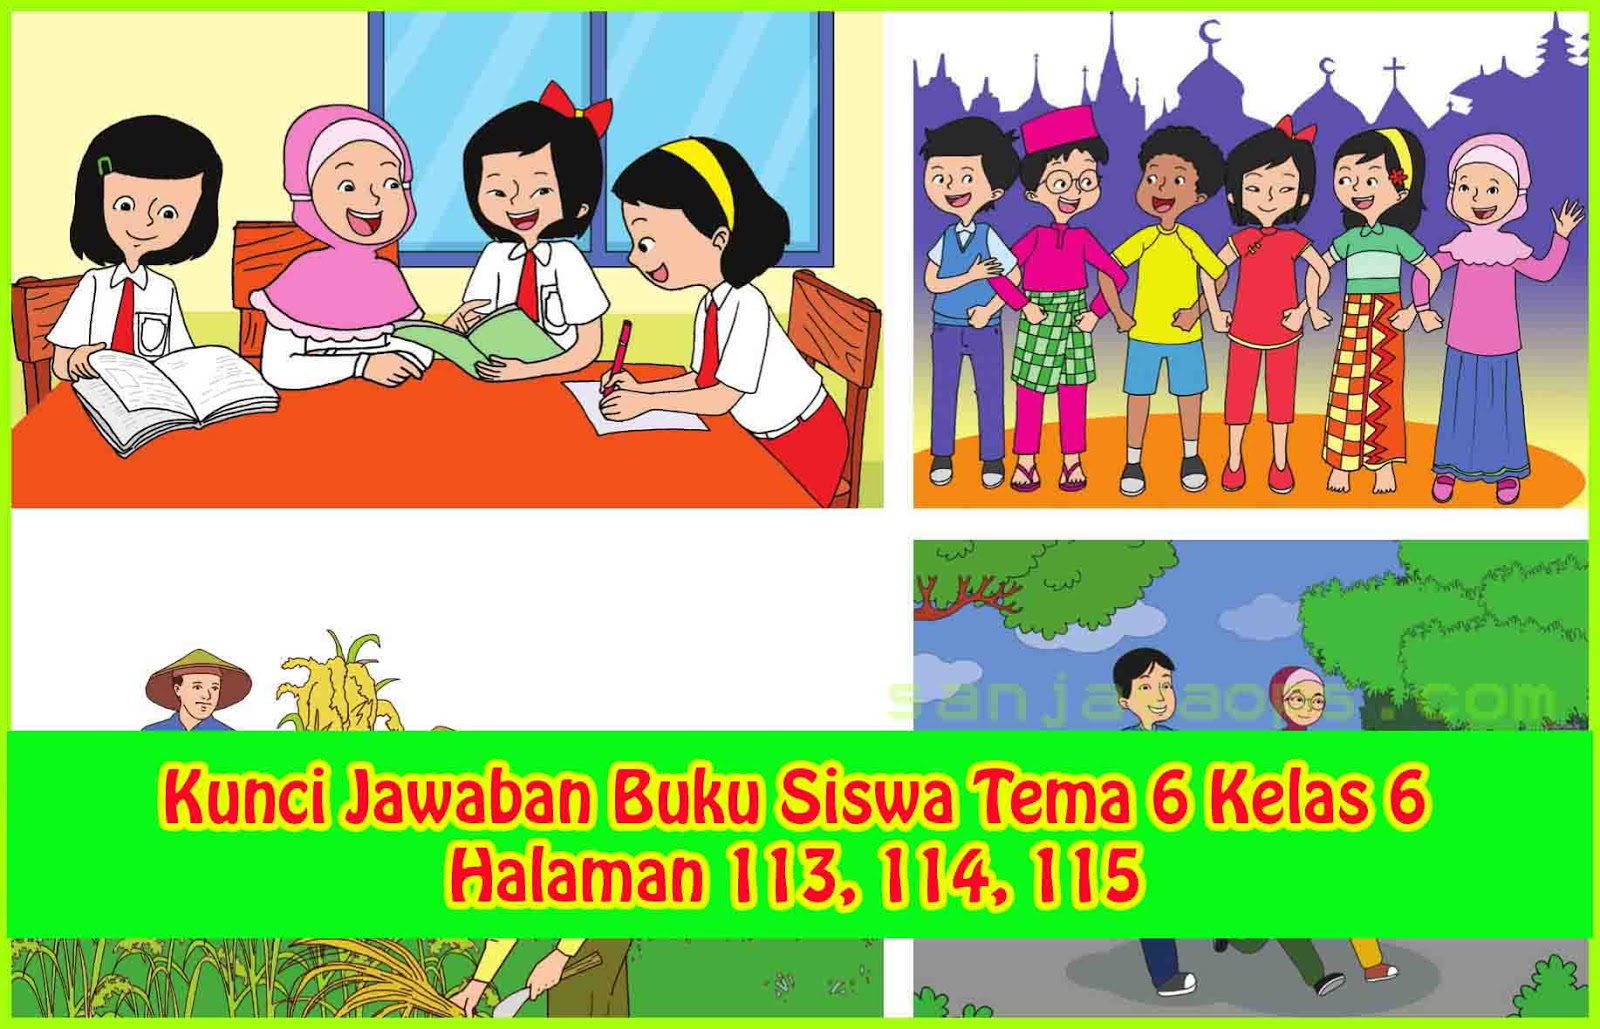 Kunci Jawaban Buku Tematik Tema 6 Kelas 5 Halaman 138 139 141